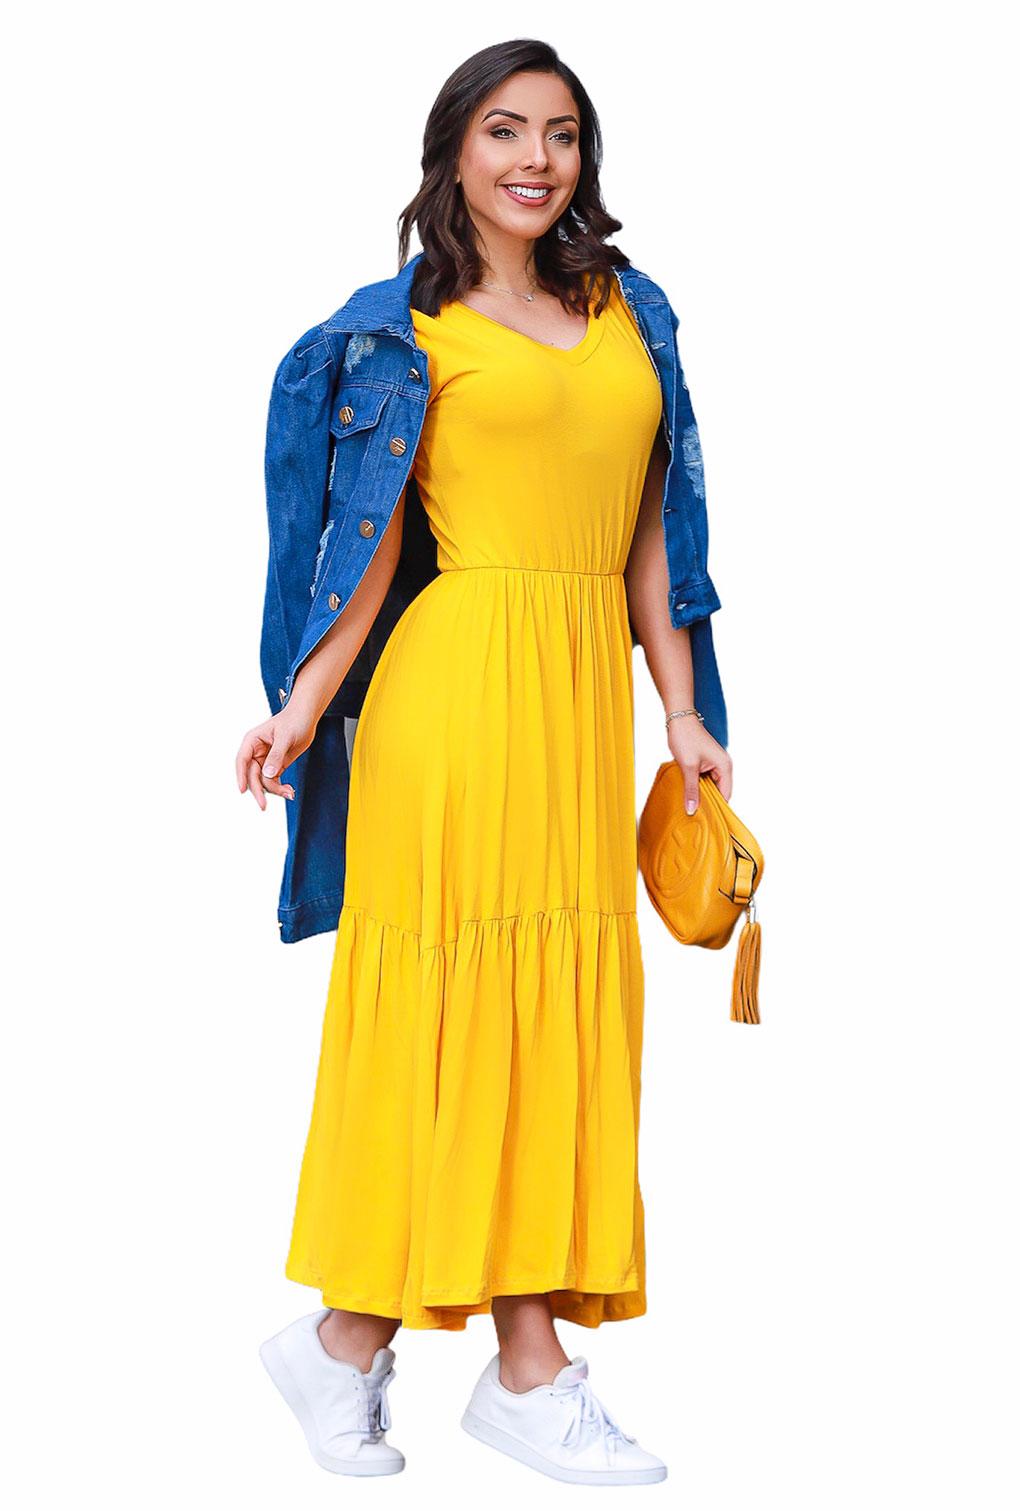 Vestido Babado Midi Soltinho Blogueira Manga Curta Amarelo  - ModaStore   Moda Feminina